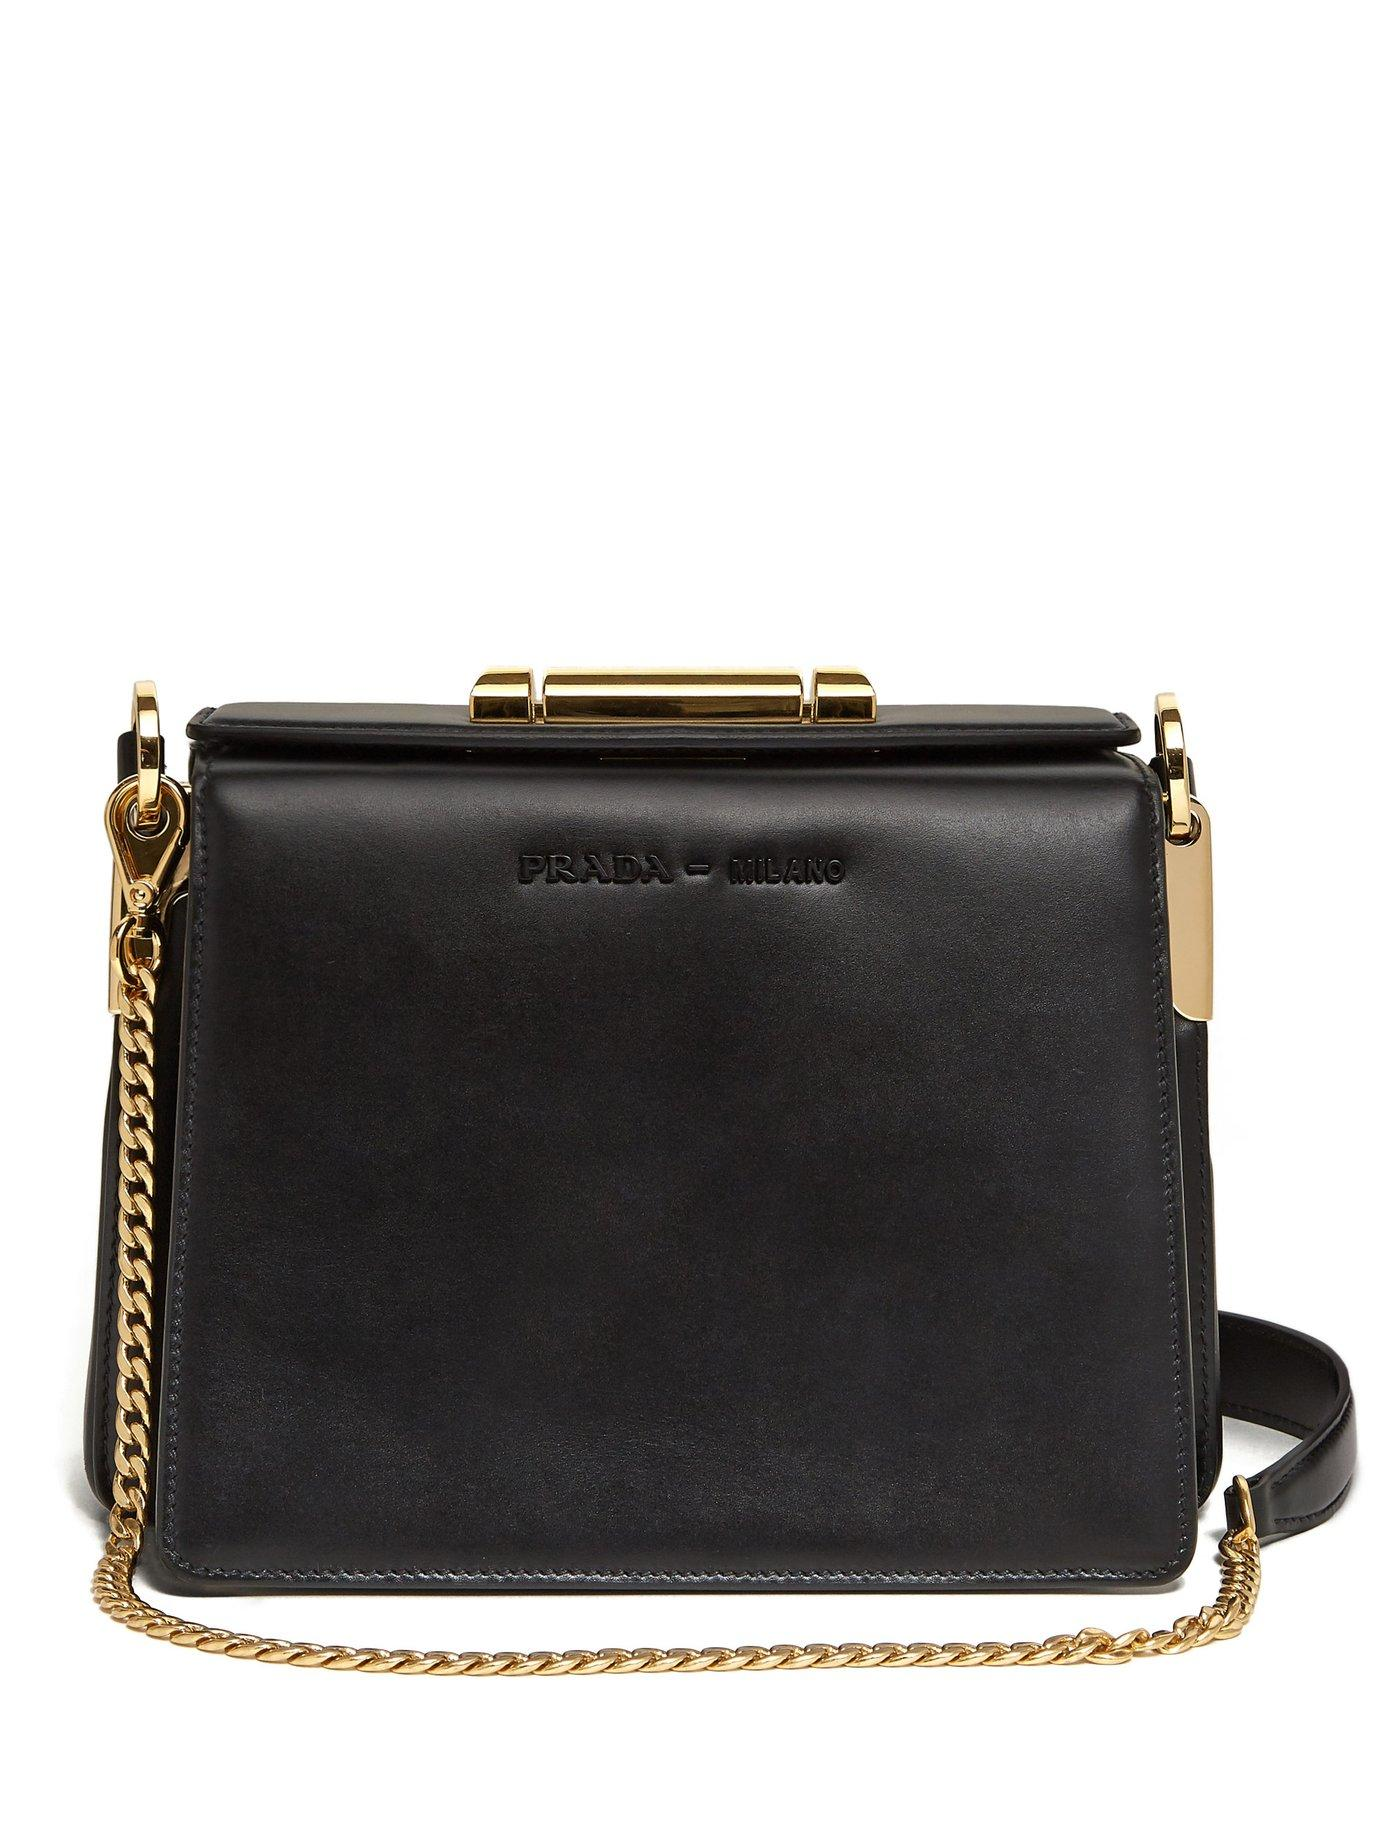 889b78c8532d Lyst - Prada Sybille Leather Cross Body Bag in Black